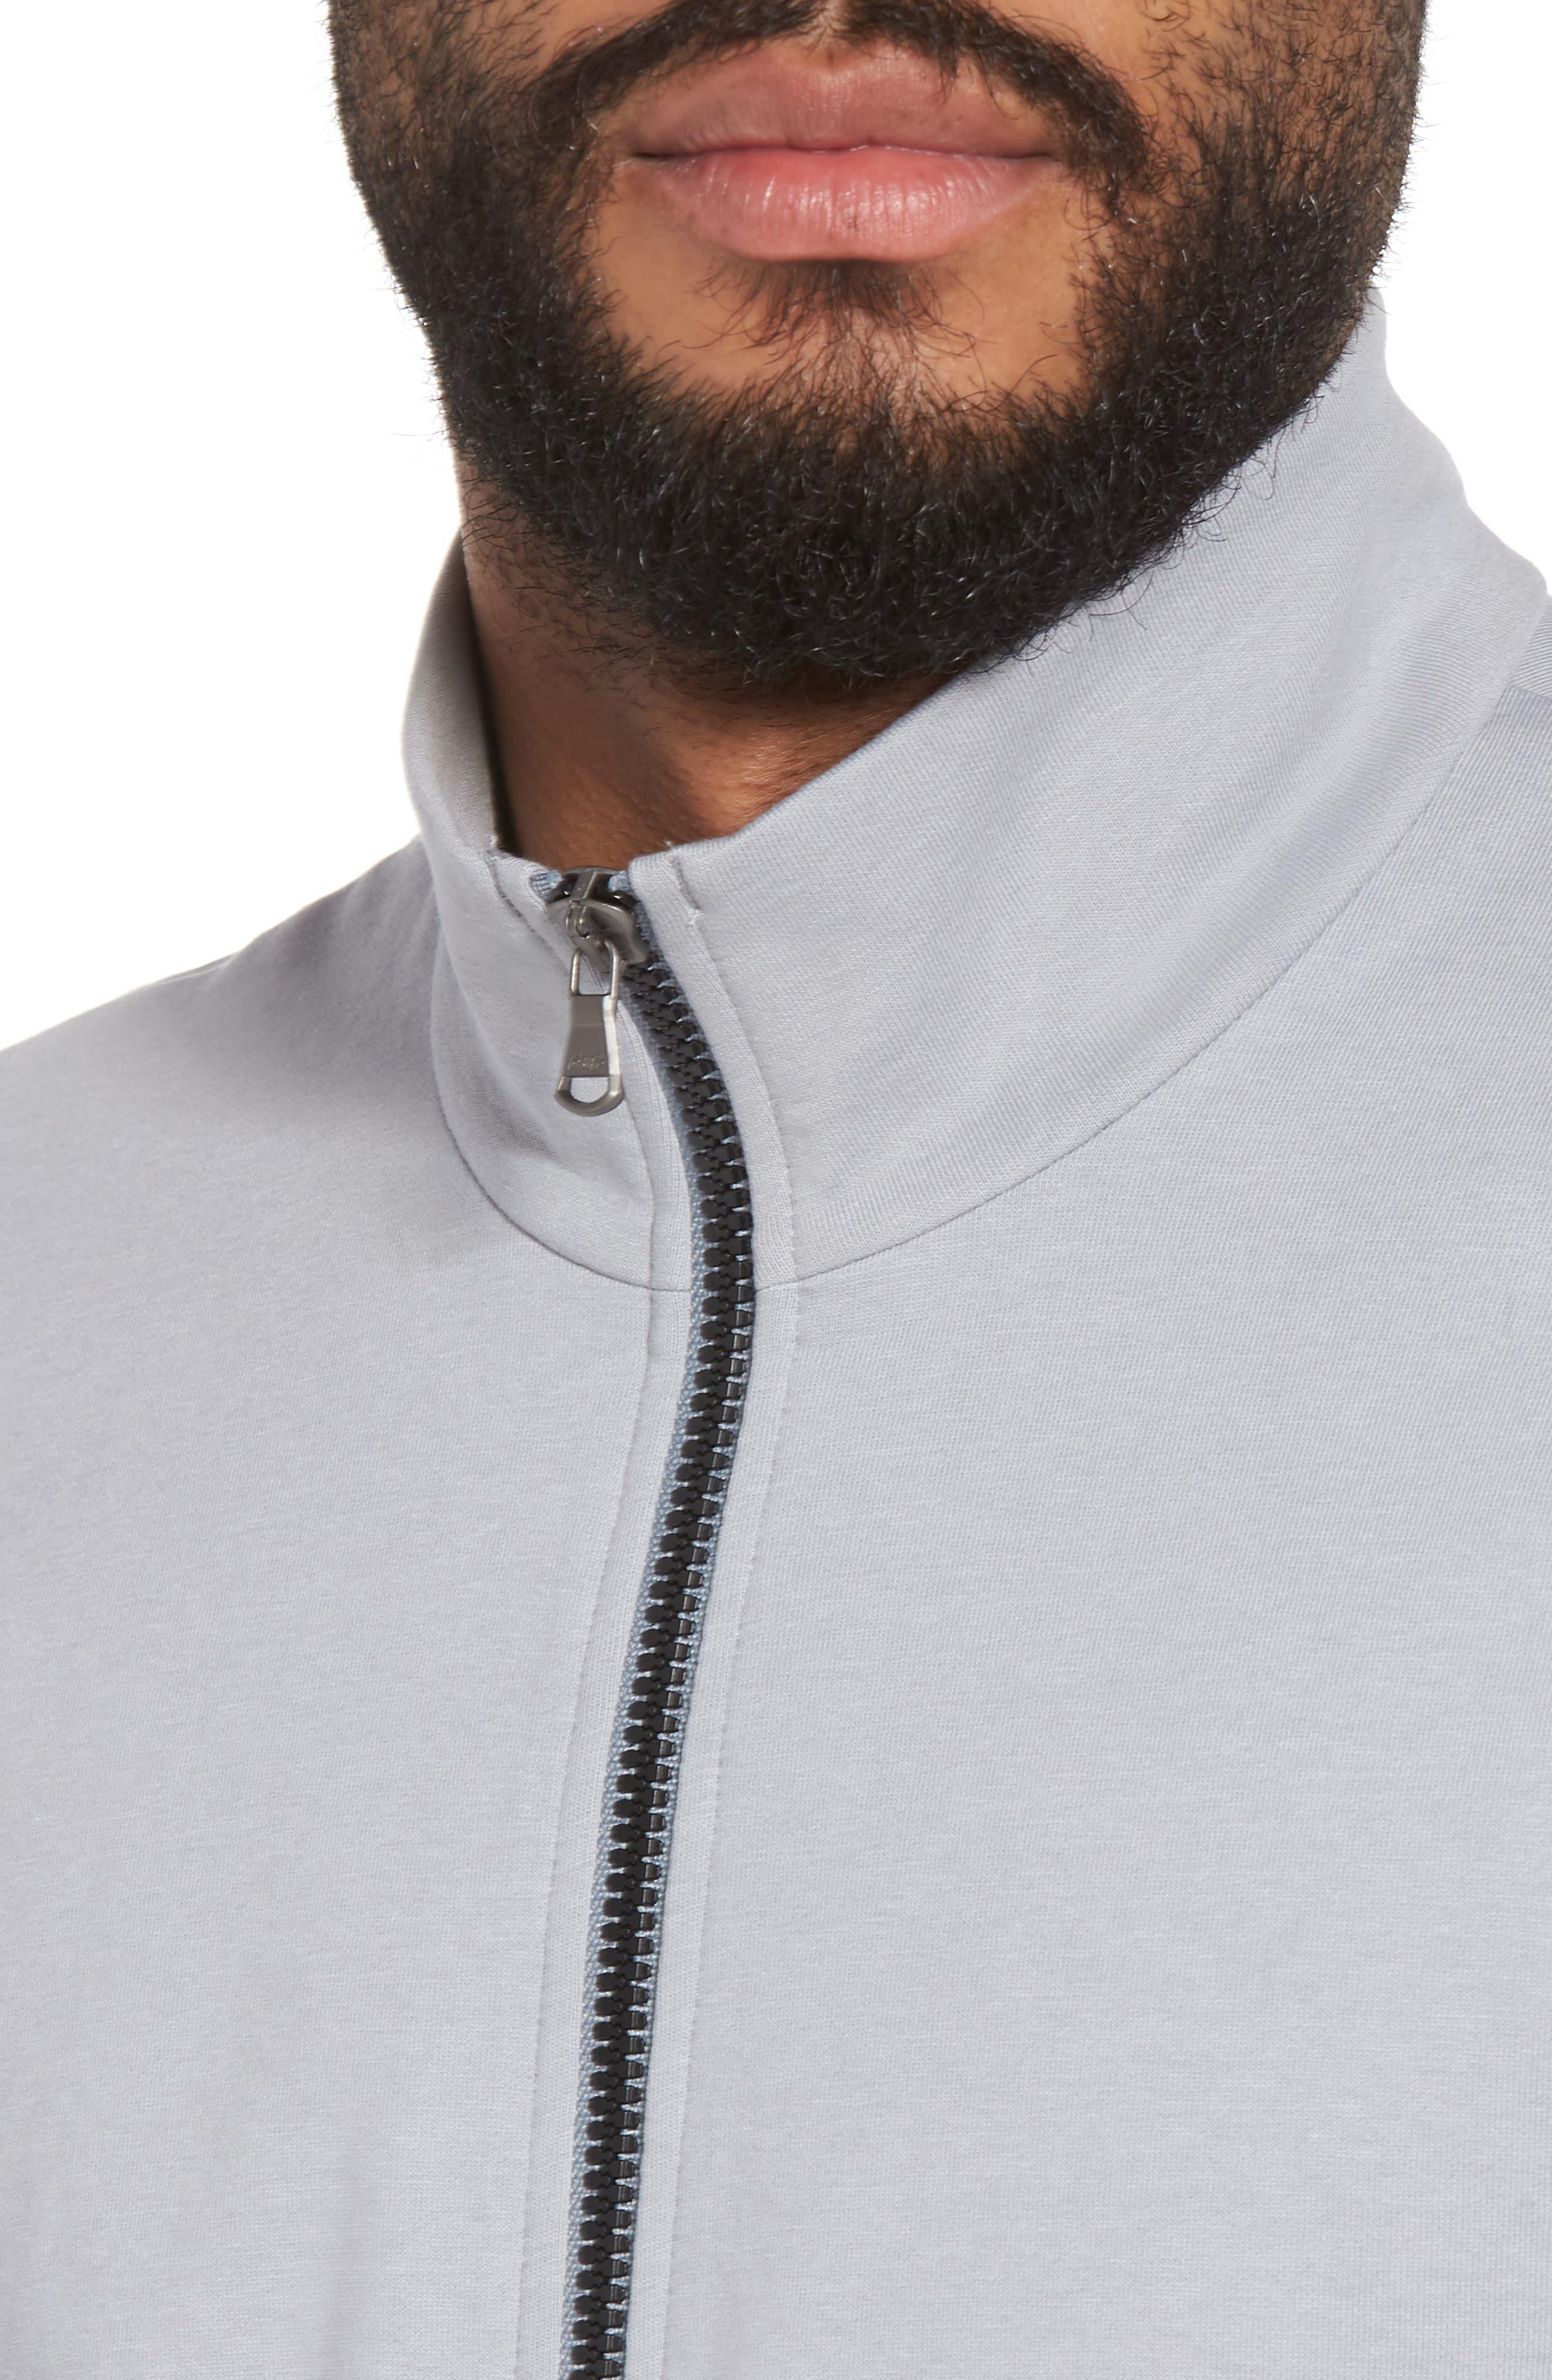 Slim Fit Compact Terry Zip Jacket,                             Alternate thumbnail 4, color,                             Grey Sky/ Light Grey